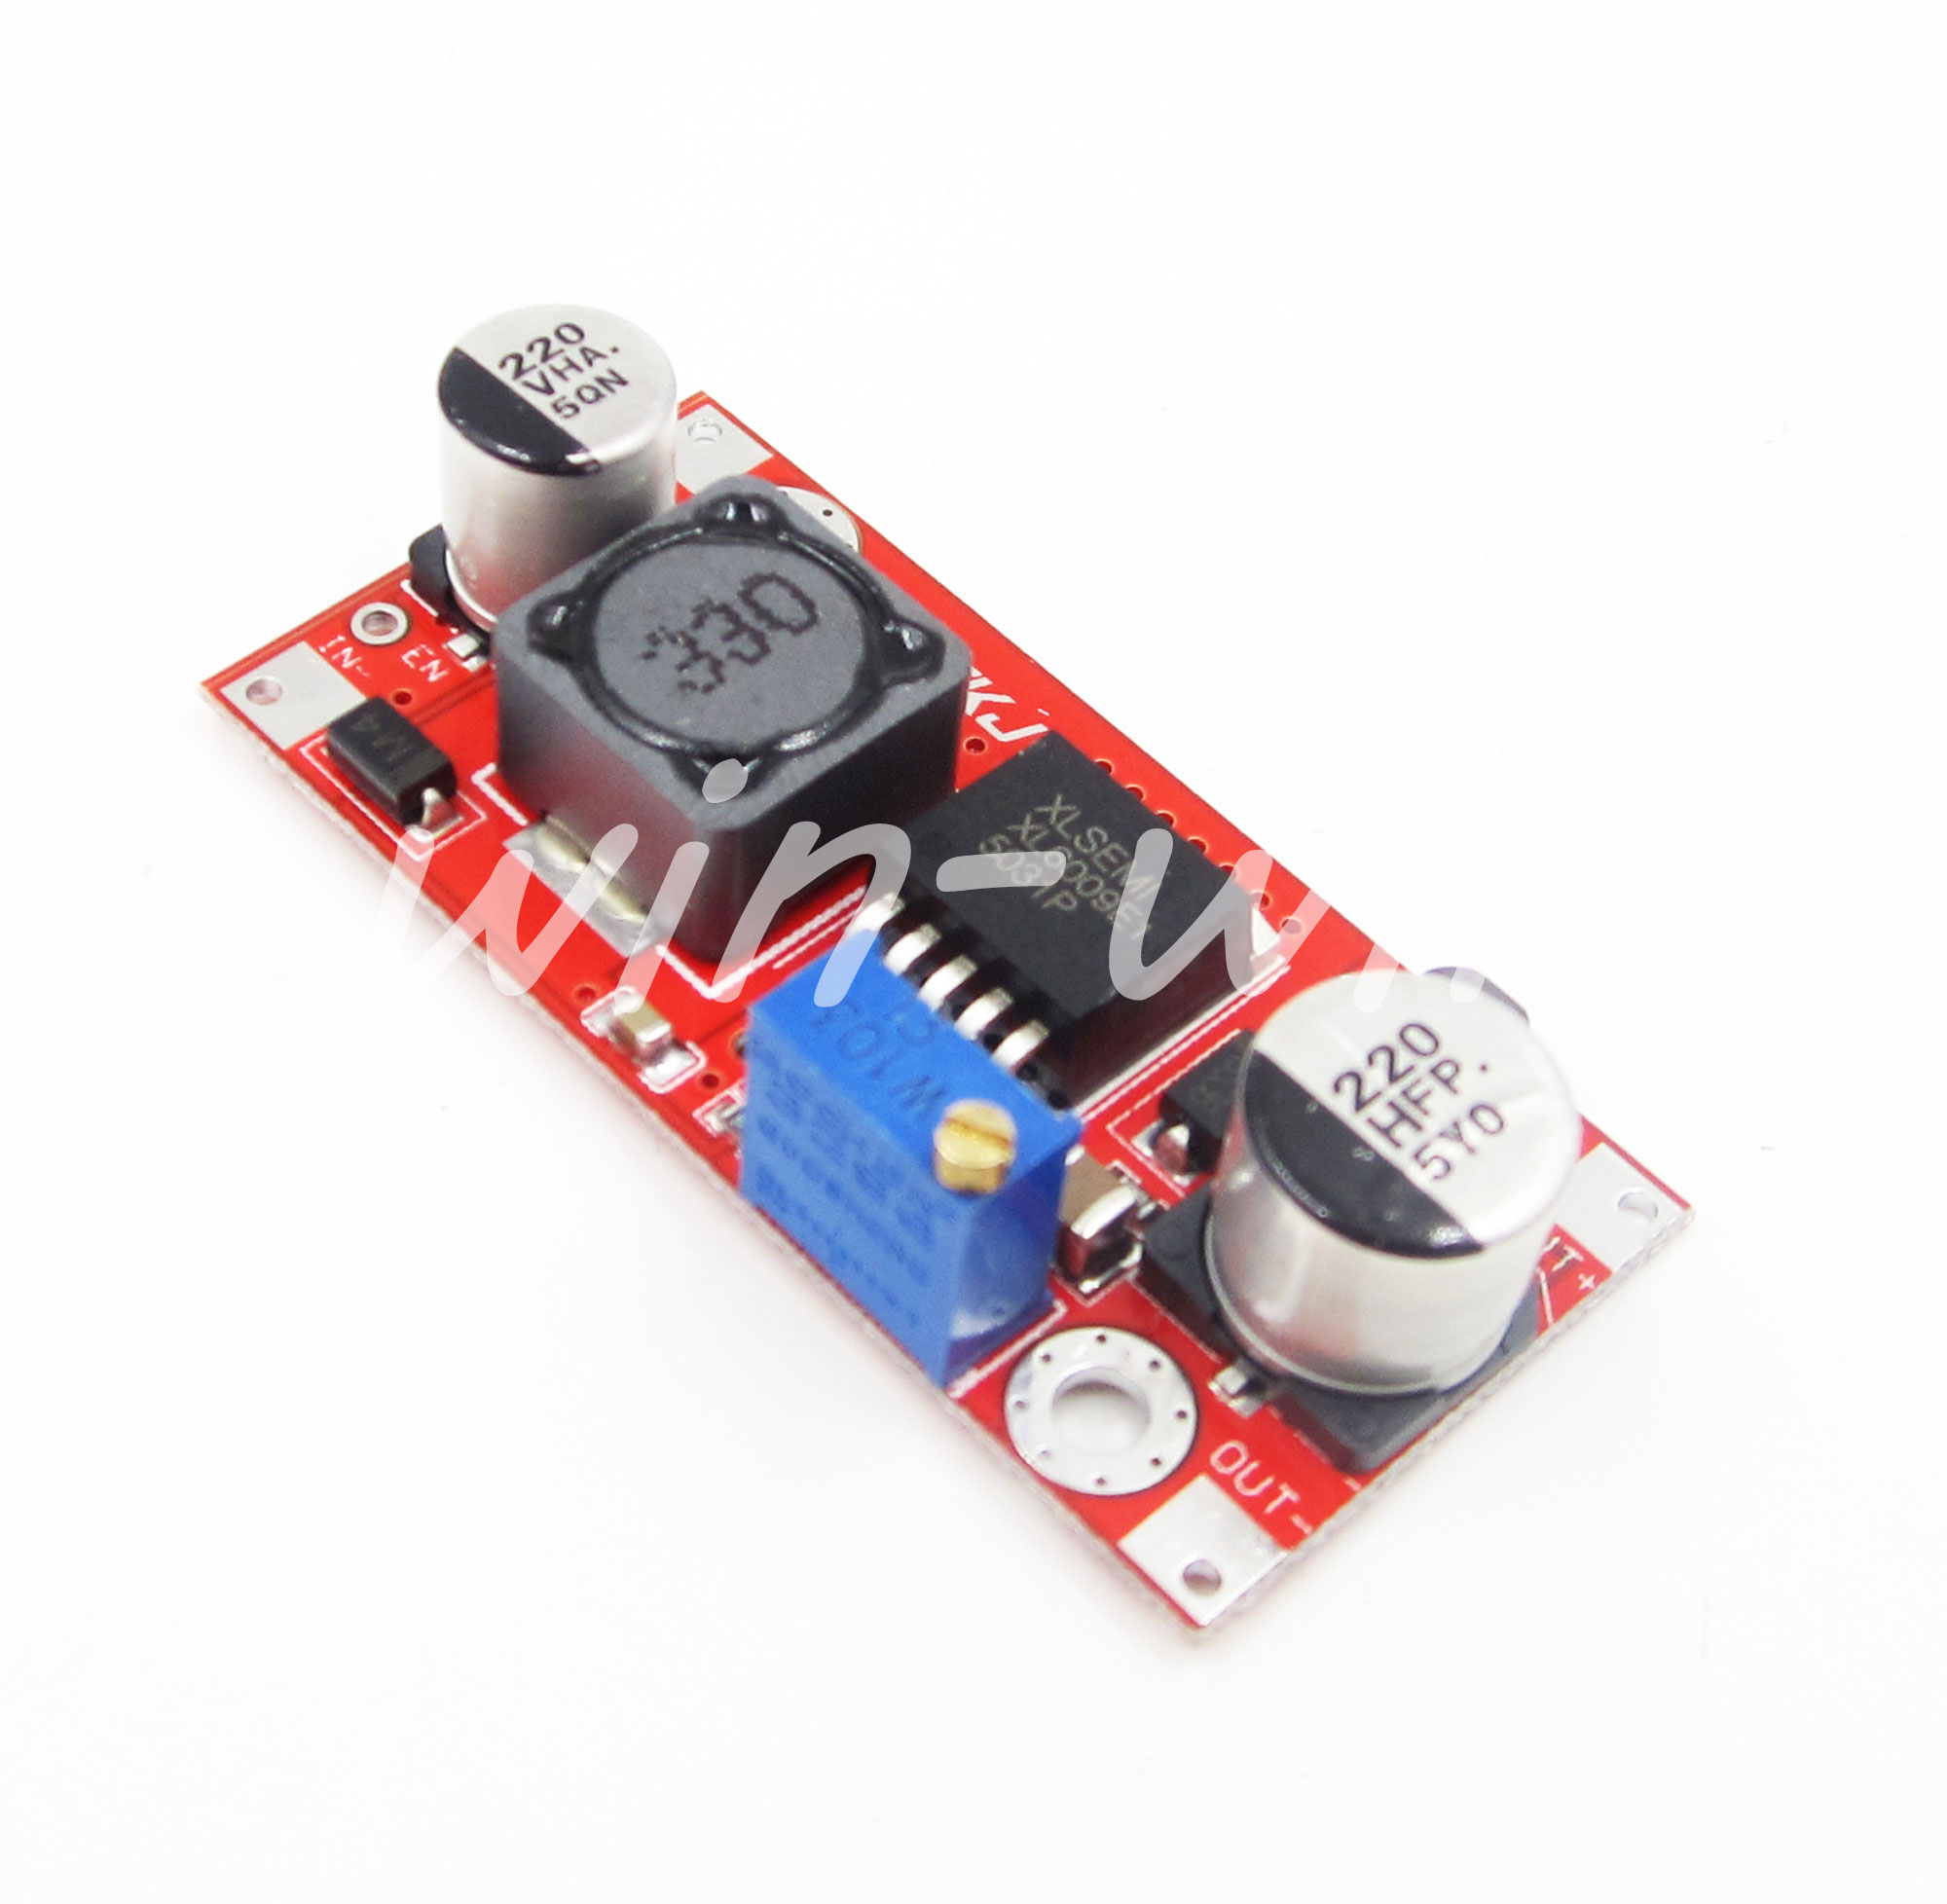 Avr Atmega16 Minimum System Board Atmega32 Usb Isp Usbasp Atmel Programmer Circuit Zif Socket Atmega8 2 Aeproductgetsubject